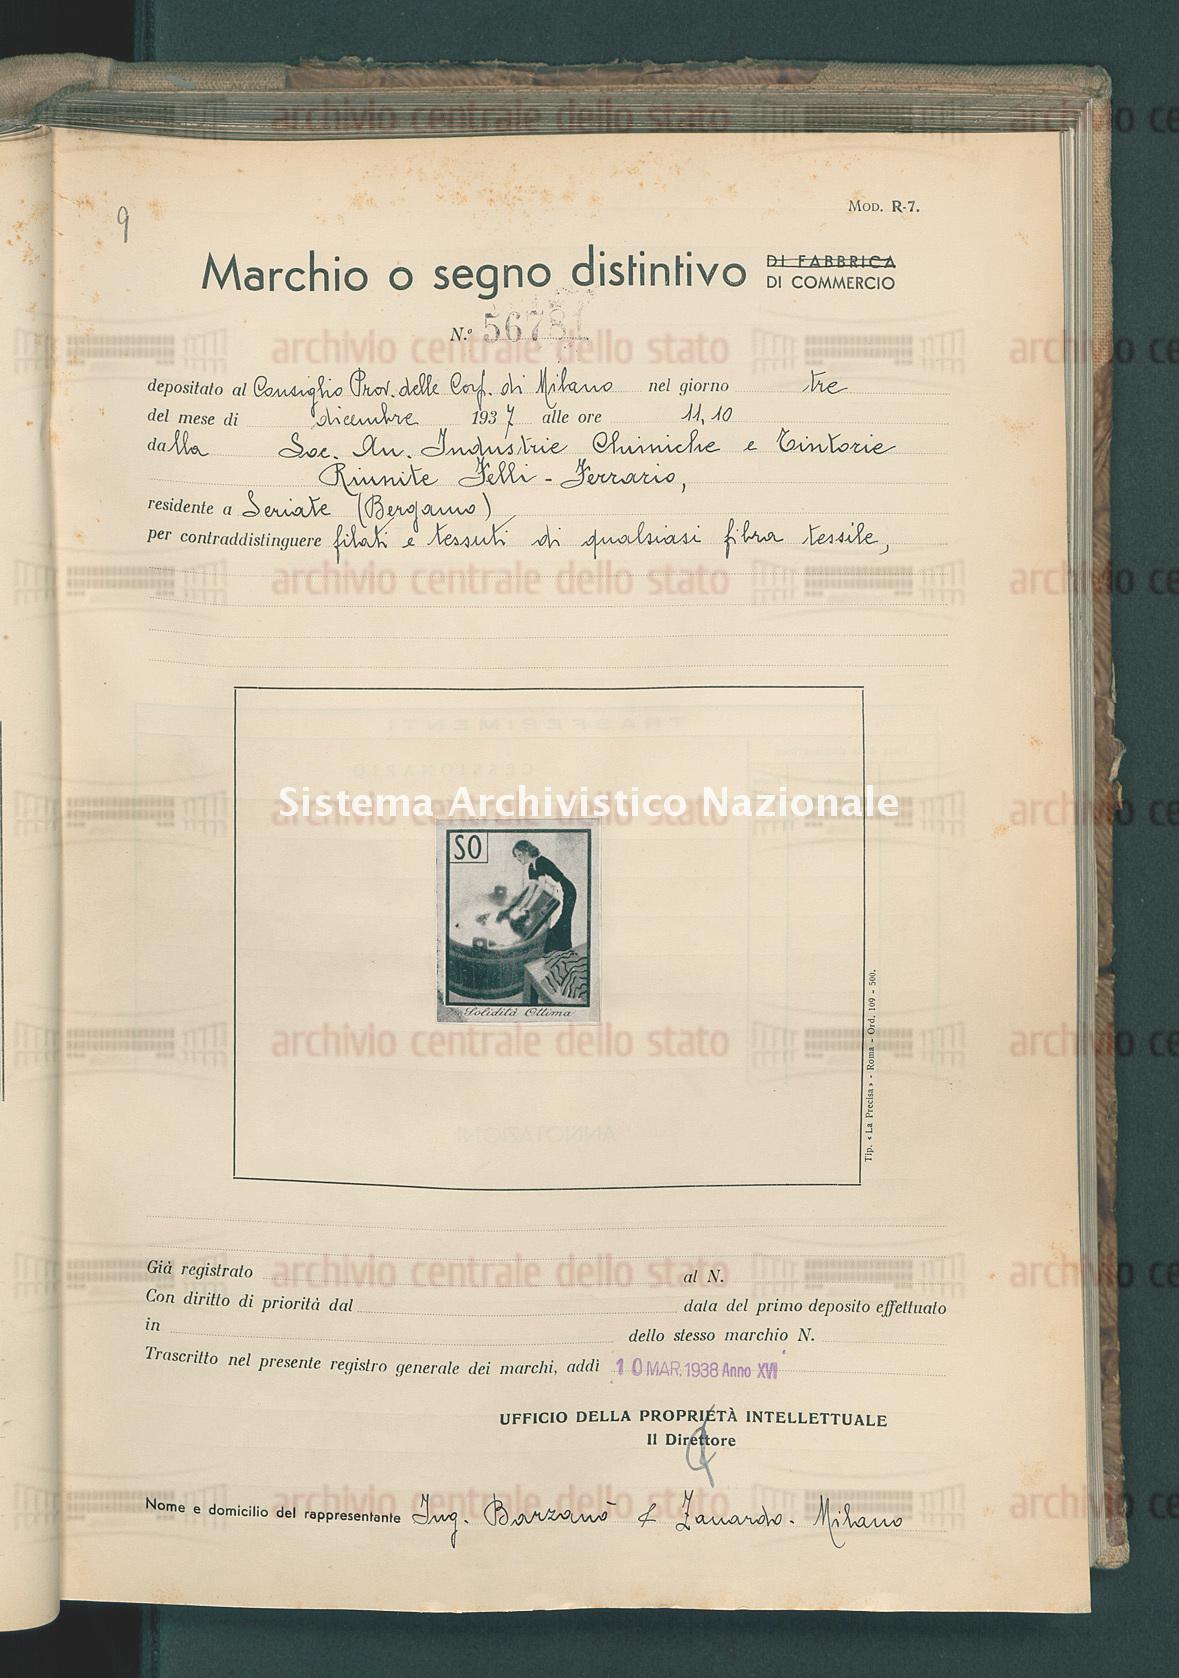 Filati e tessuti di qualsiasi fibra tessile Soc. An. Industrie Chimiche E Tintorie Riunite Felli-Ferrario (10/03/1938)